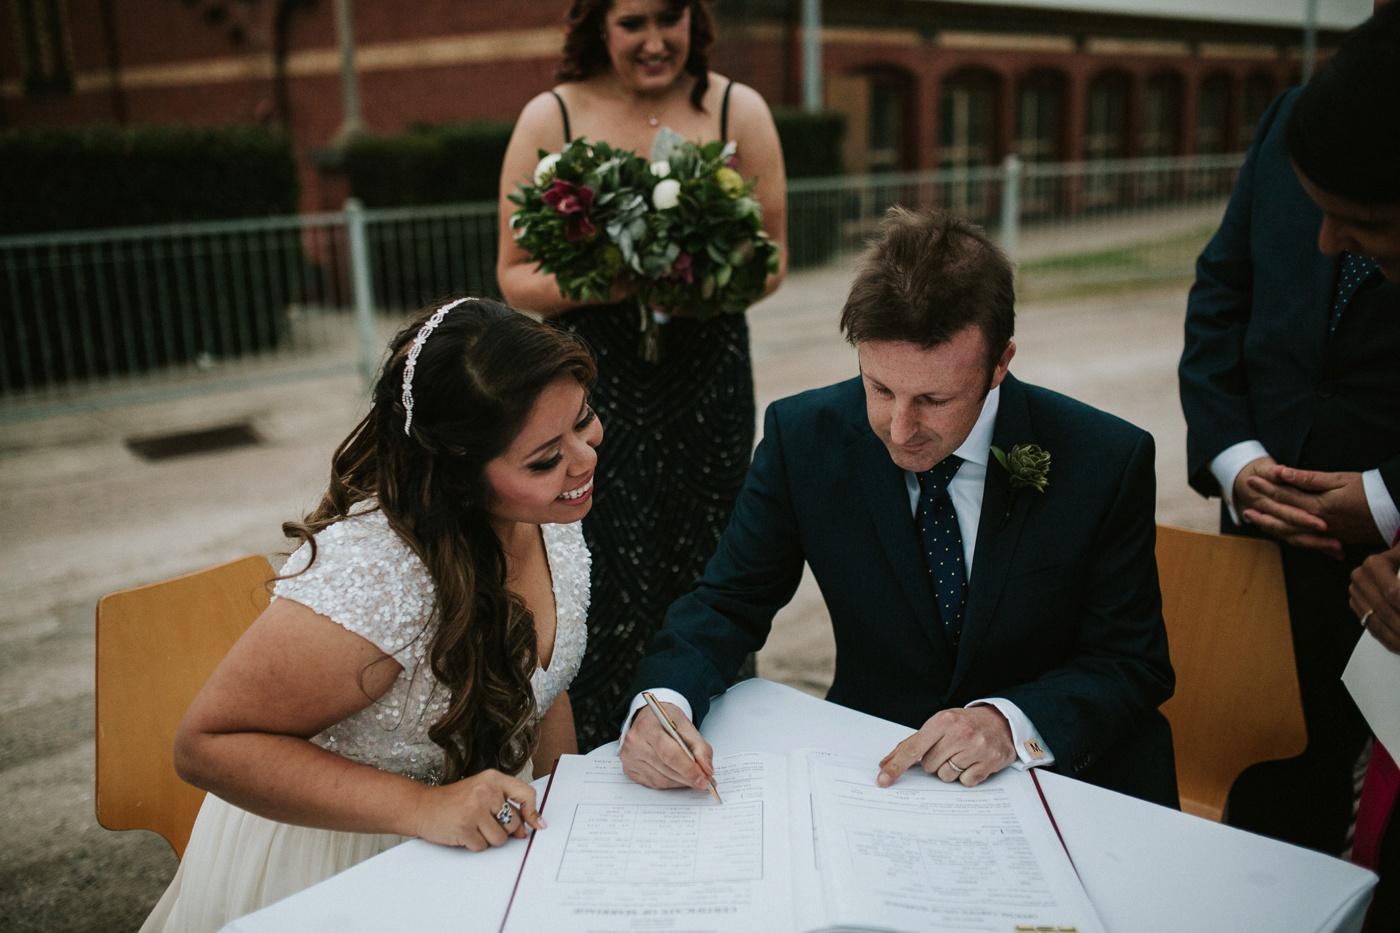 anitadaniel_melbourne-scienceworks-relaxed-fun-geek-wedding_melbourne-candid-wedding-photography_51